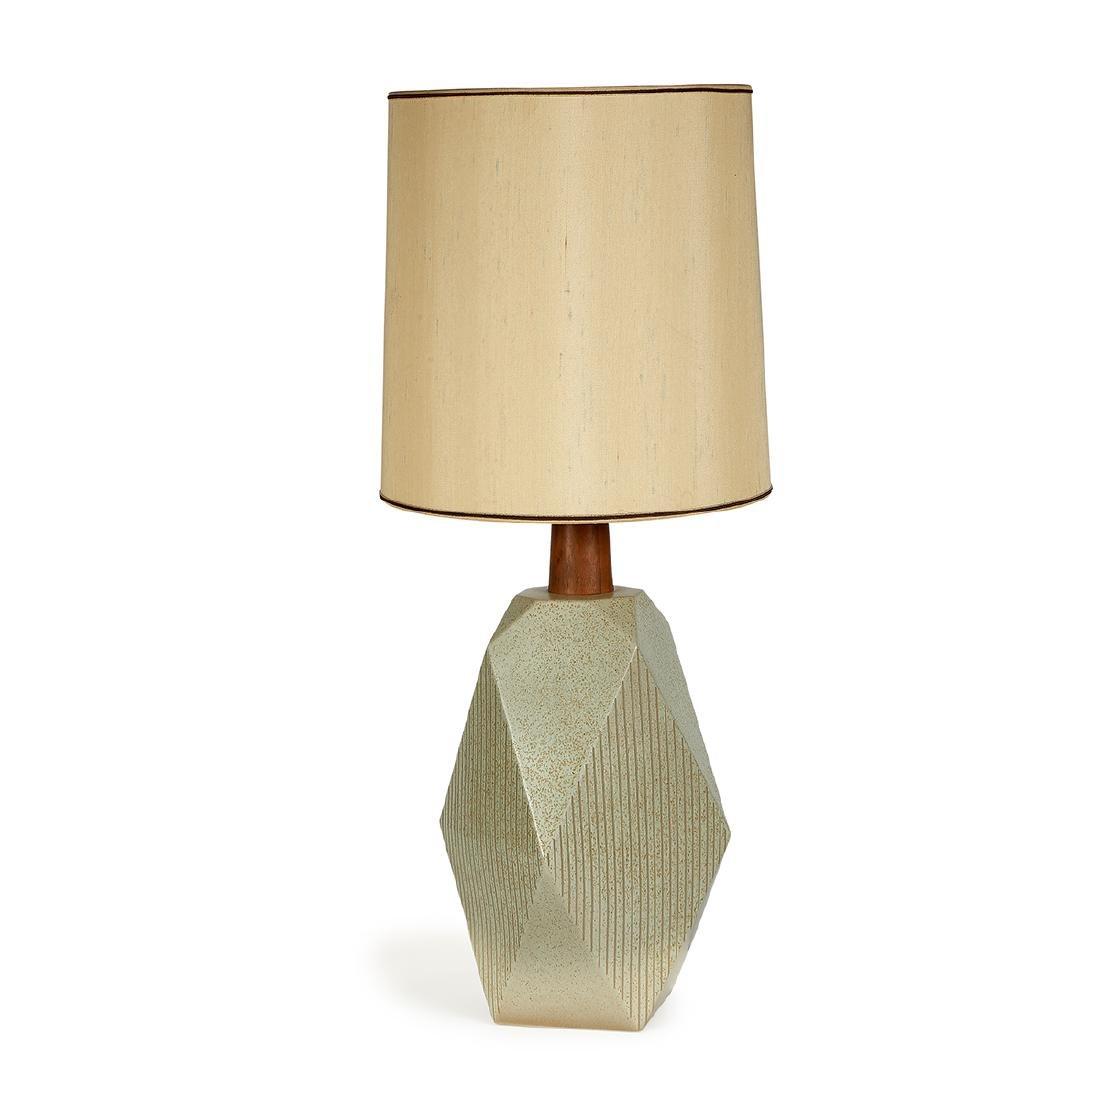 Gordon Martz & Jane Martz Rombic table lamp - 2